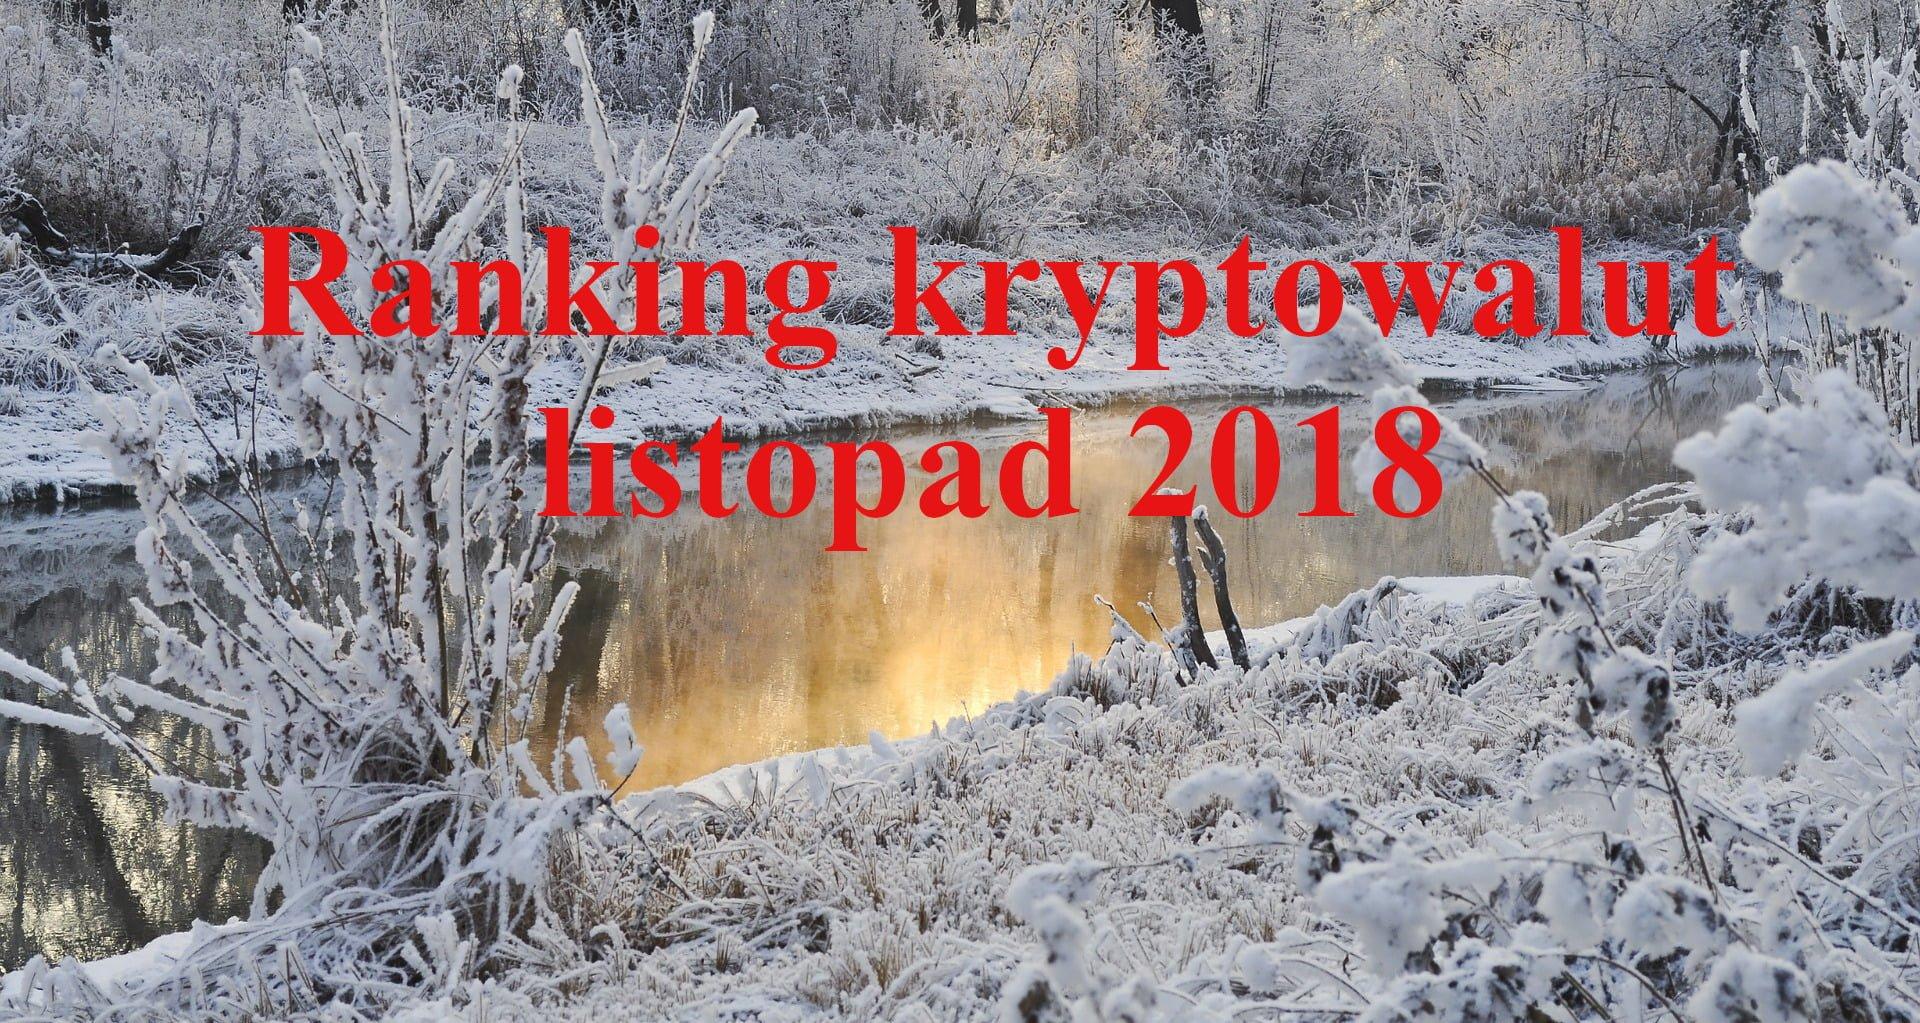 Ranking kryptowalut – listopad 2018